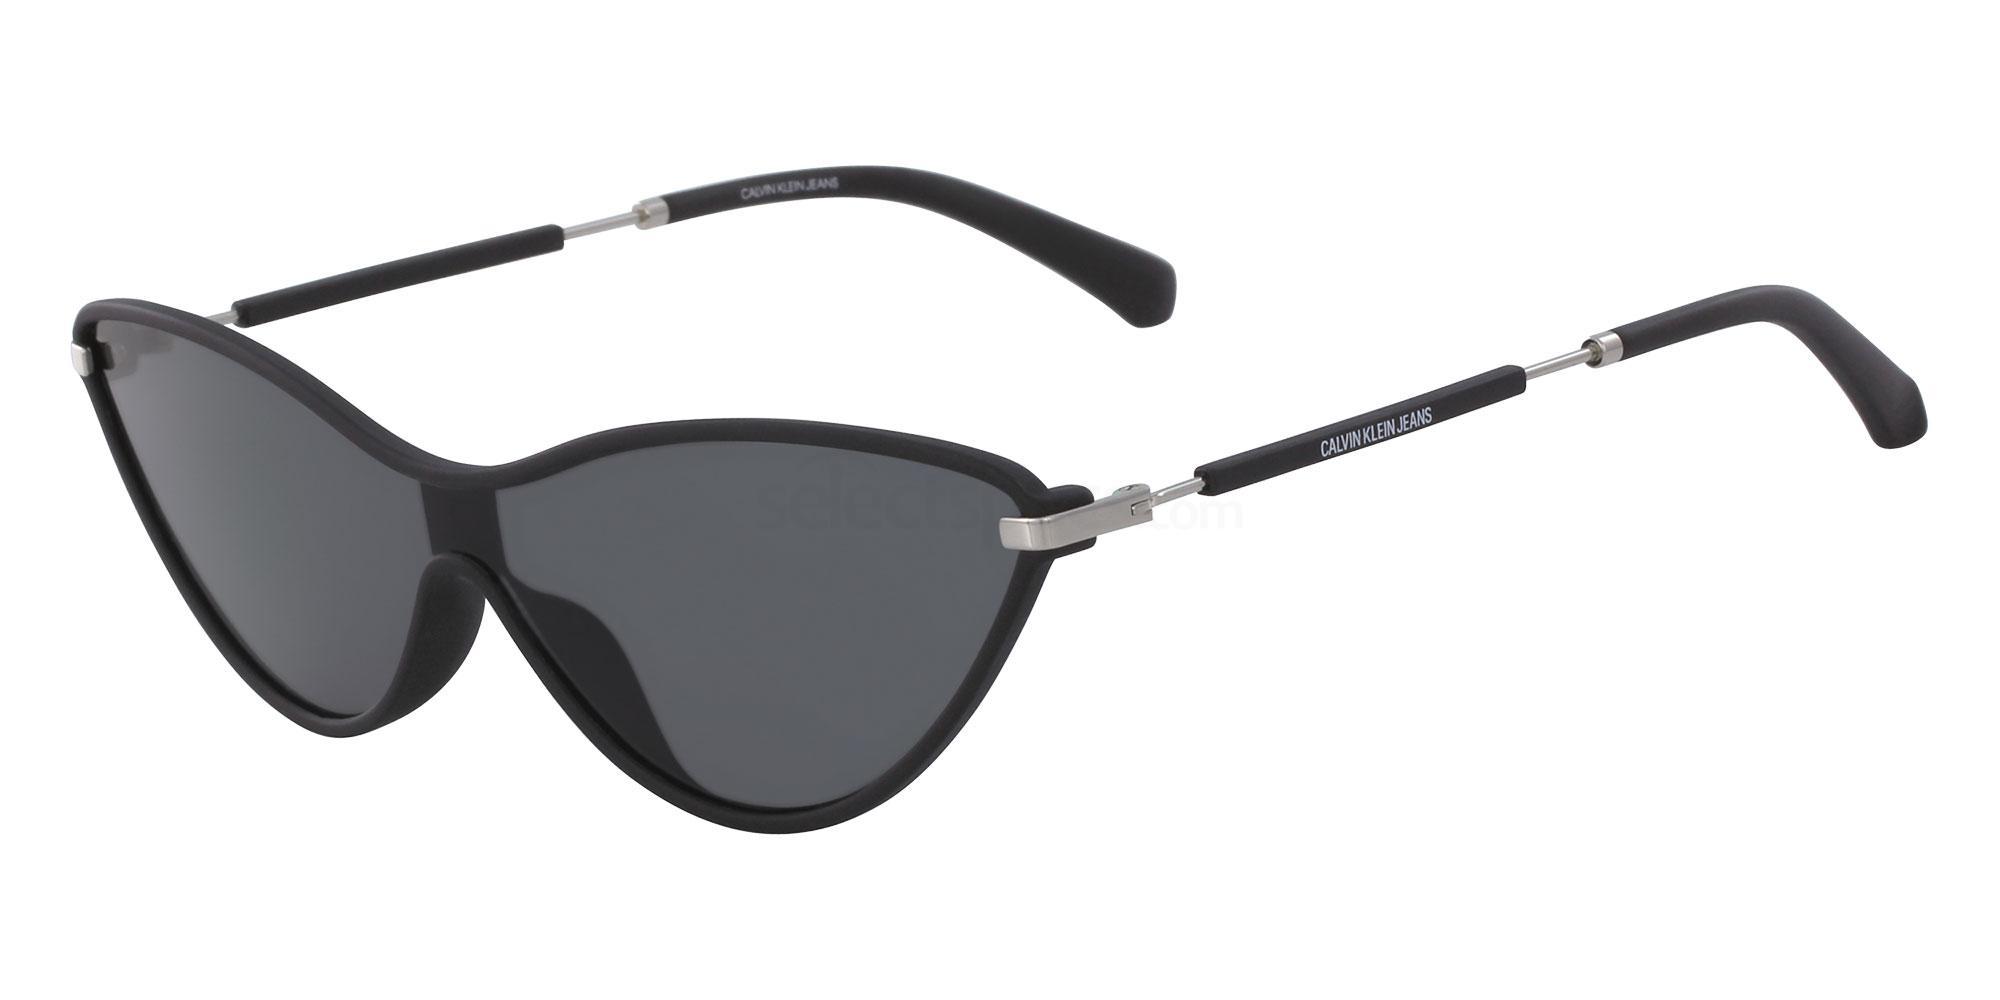 001 CKJ19702S Sunglasses, Calvin Klein Jeans